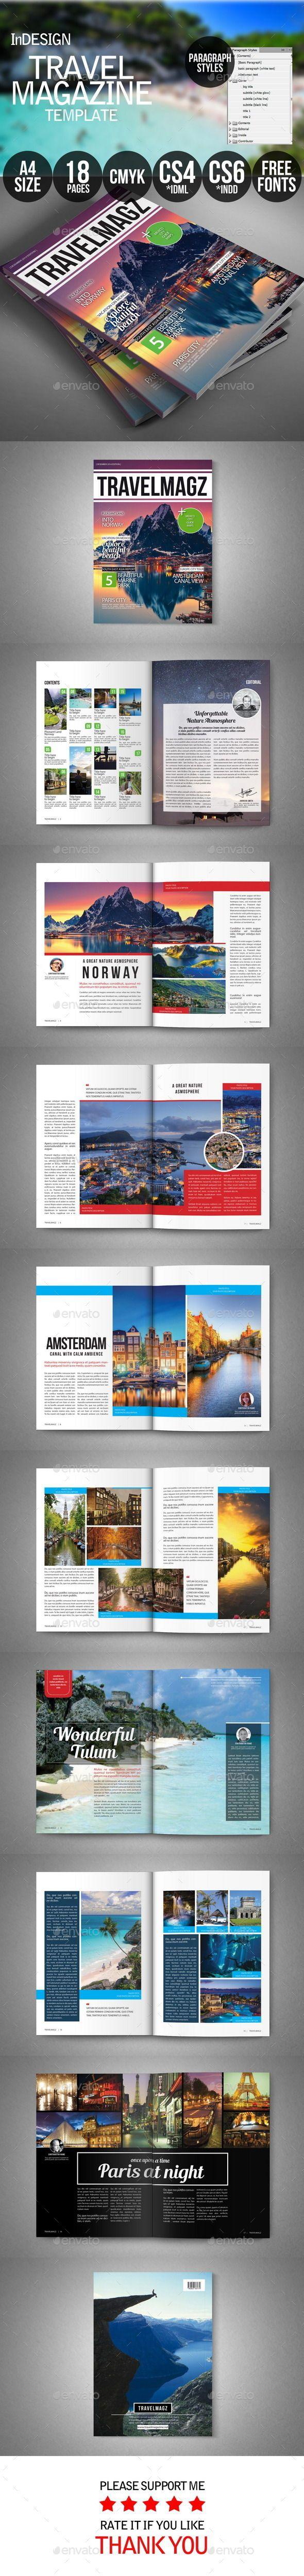 Travel Magazine Template | Download: http://graphicriver.net/item/travel-magazine/9721353?ref=ksioks